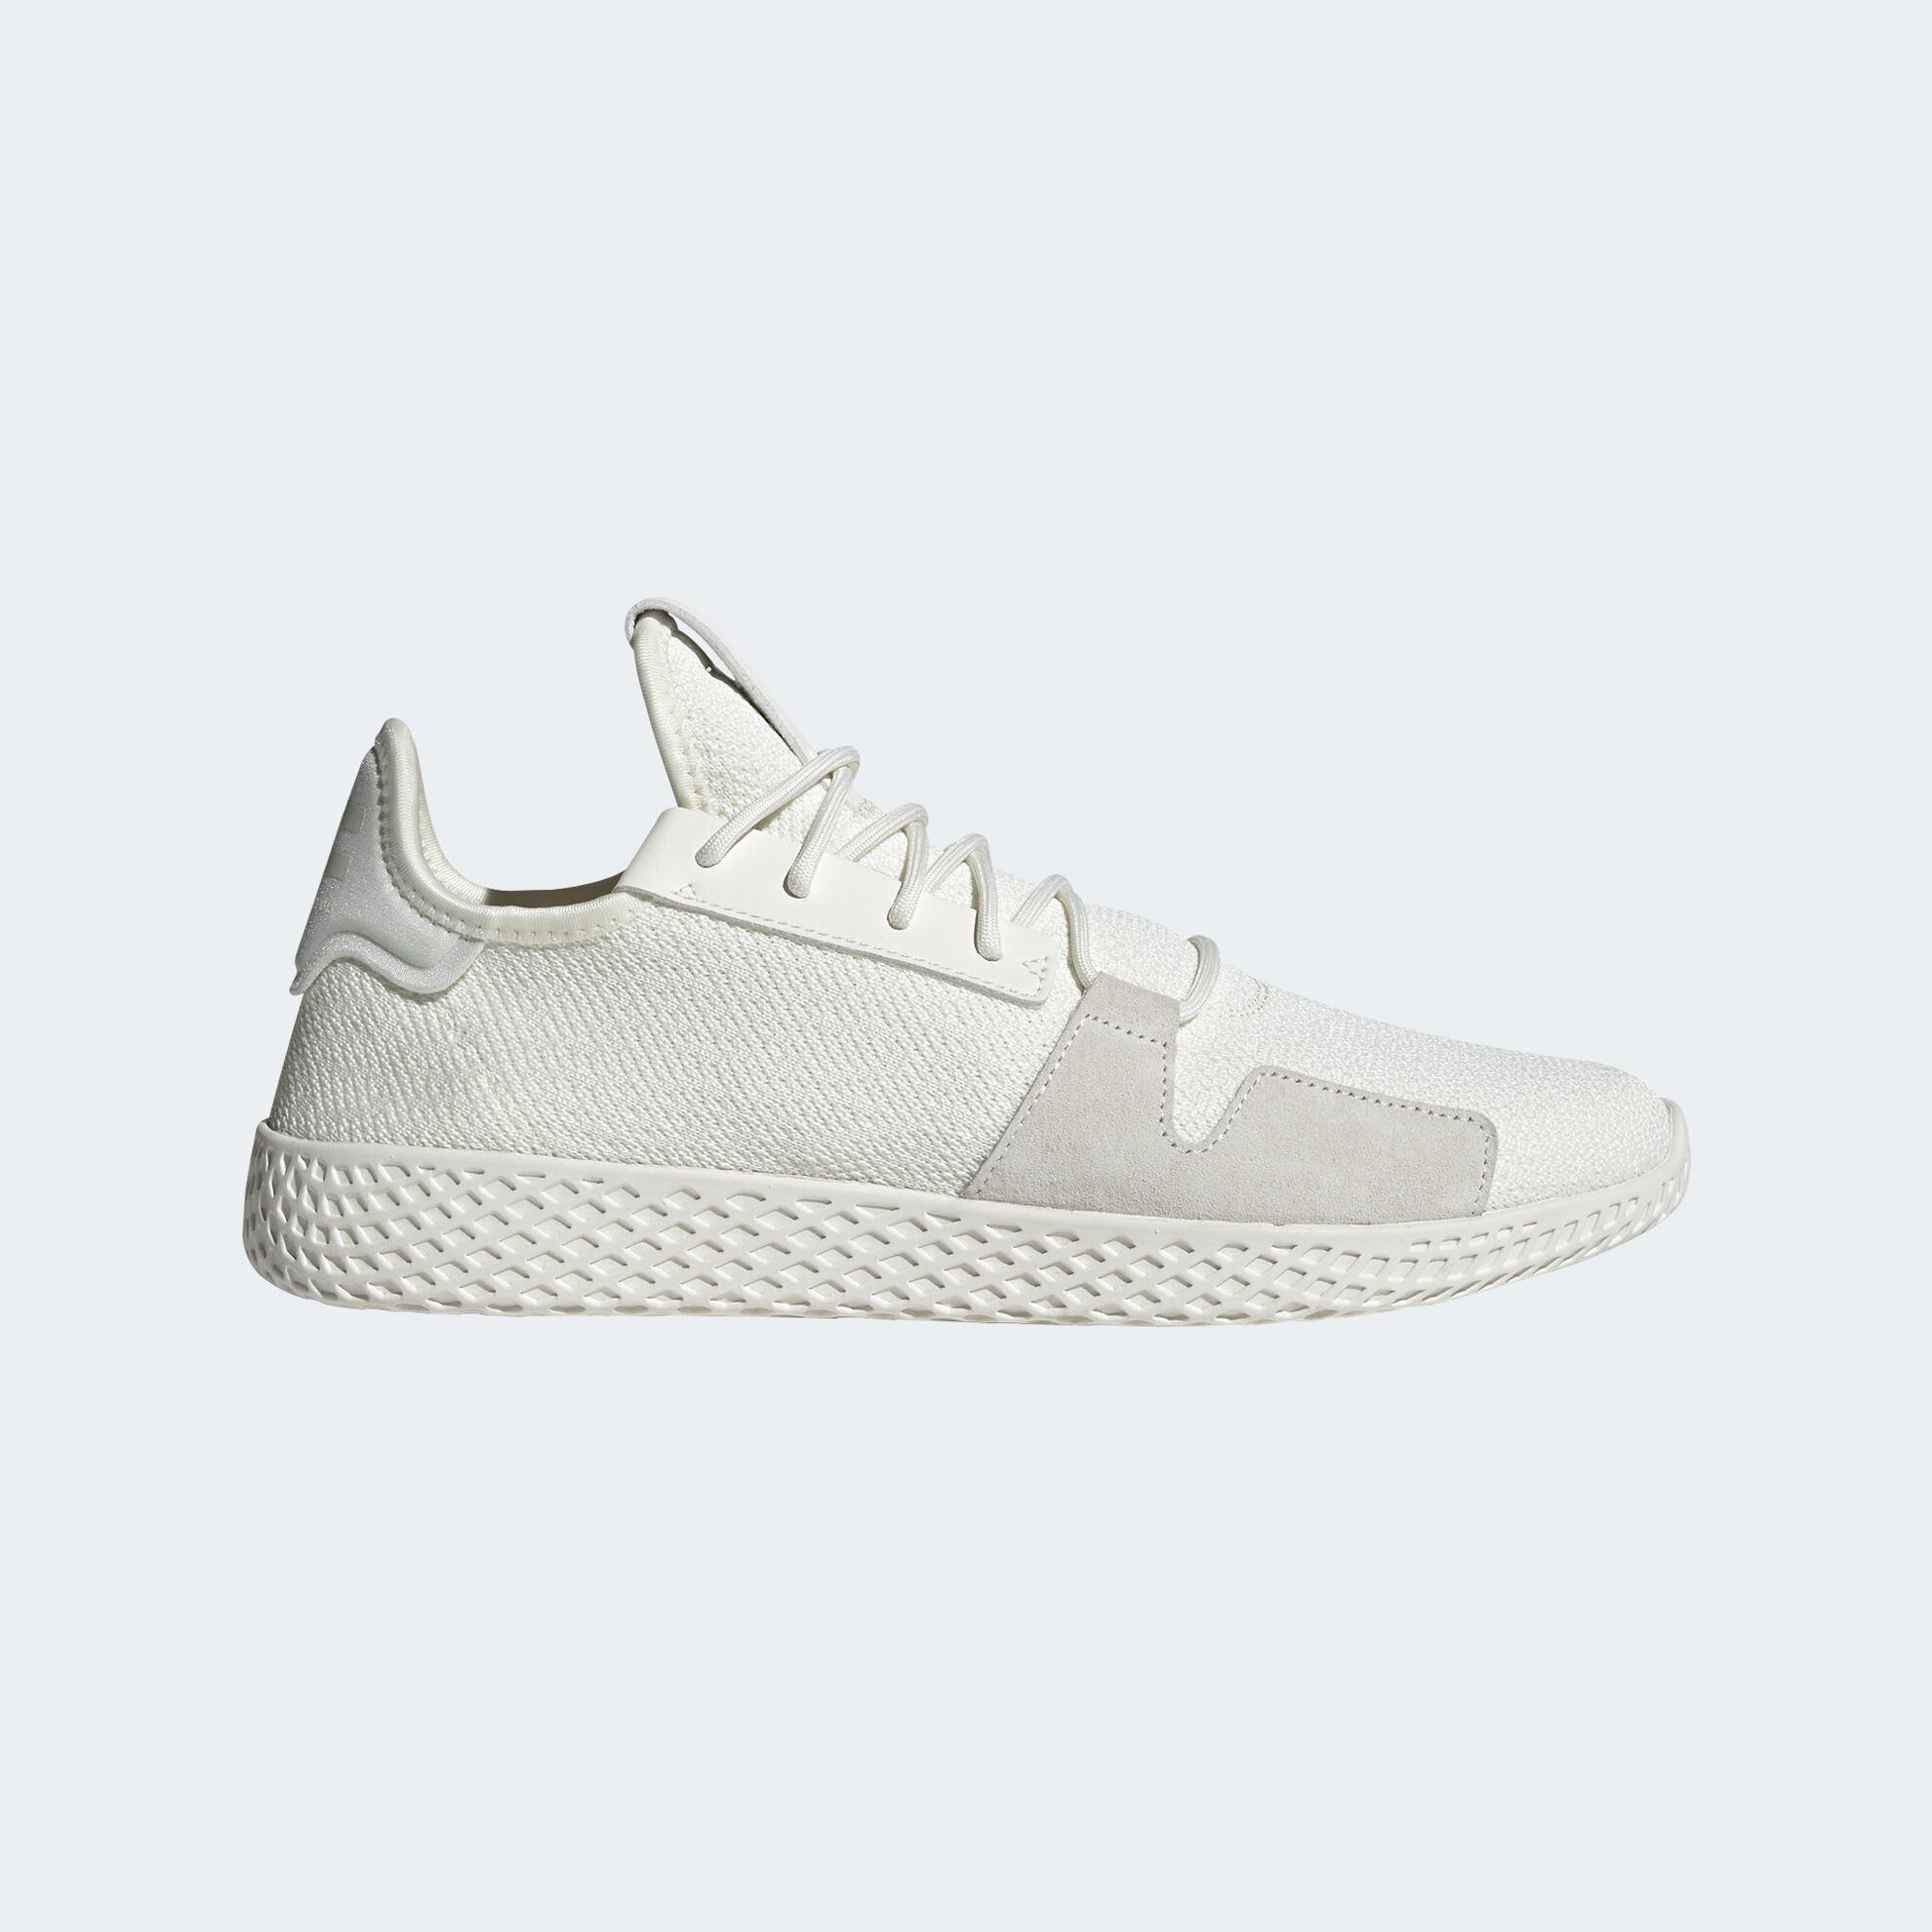 adidas Pharrell Williams Tennis Hu V2